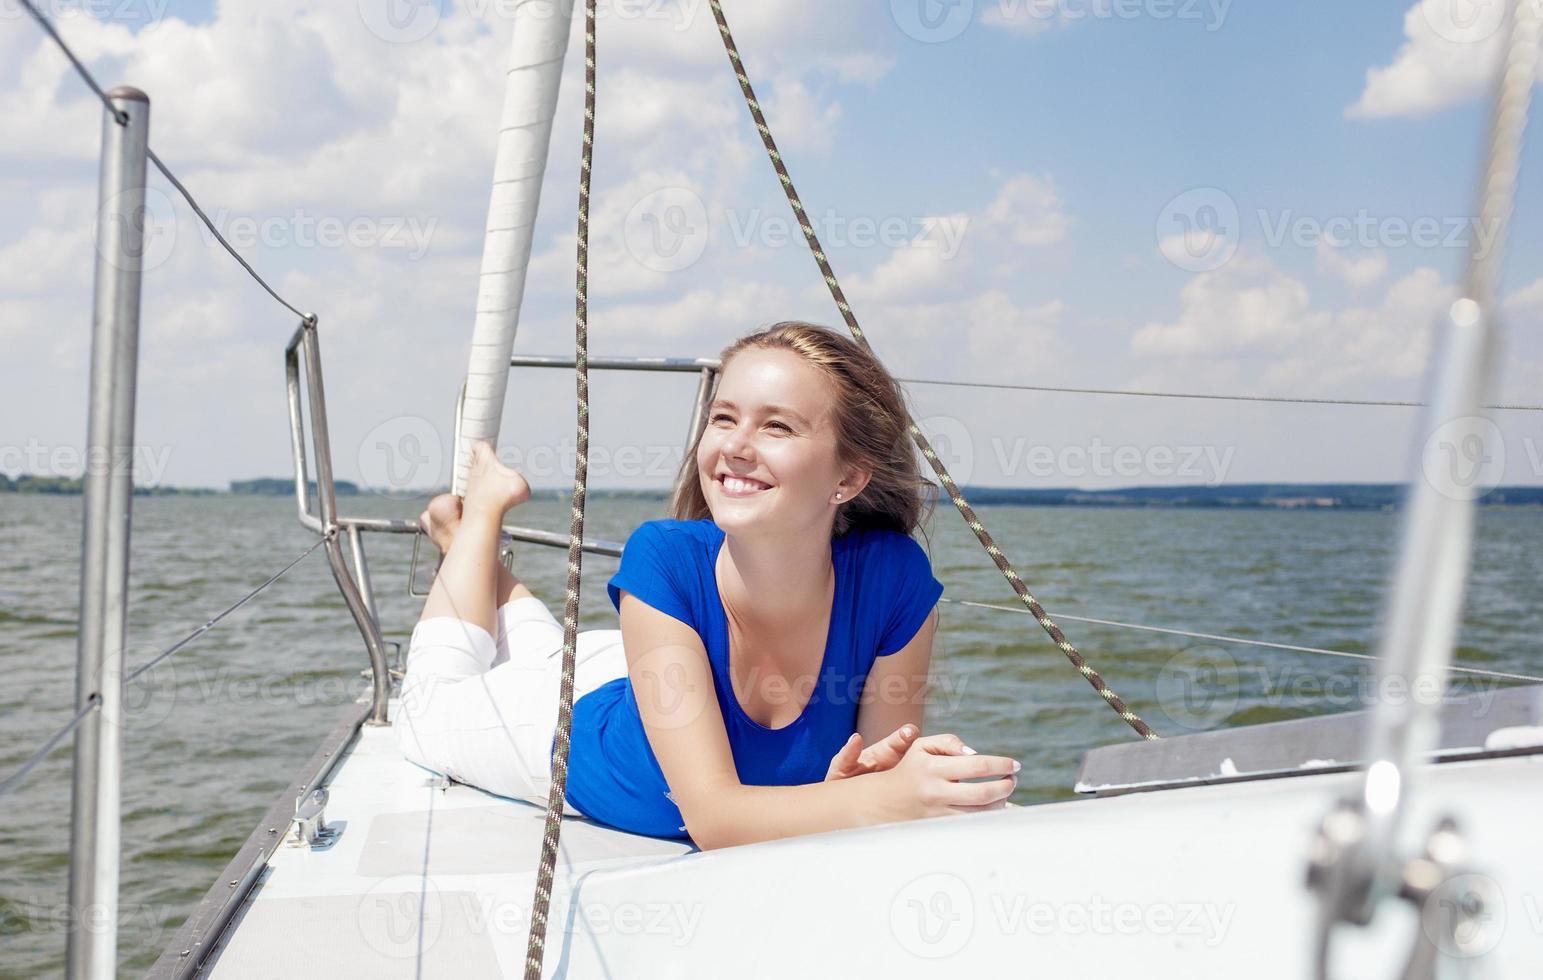 reizende concepten: lachende positieve blanke vrouw op wit jacht foto